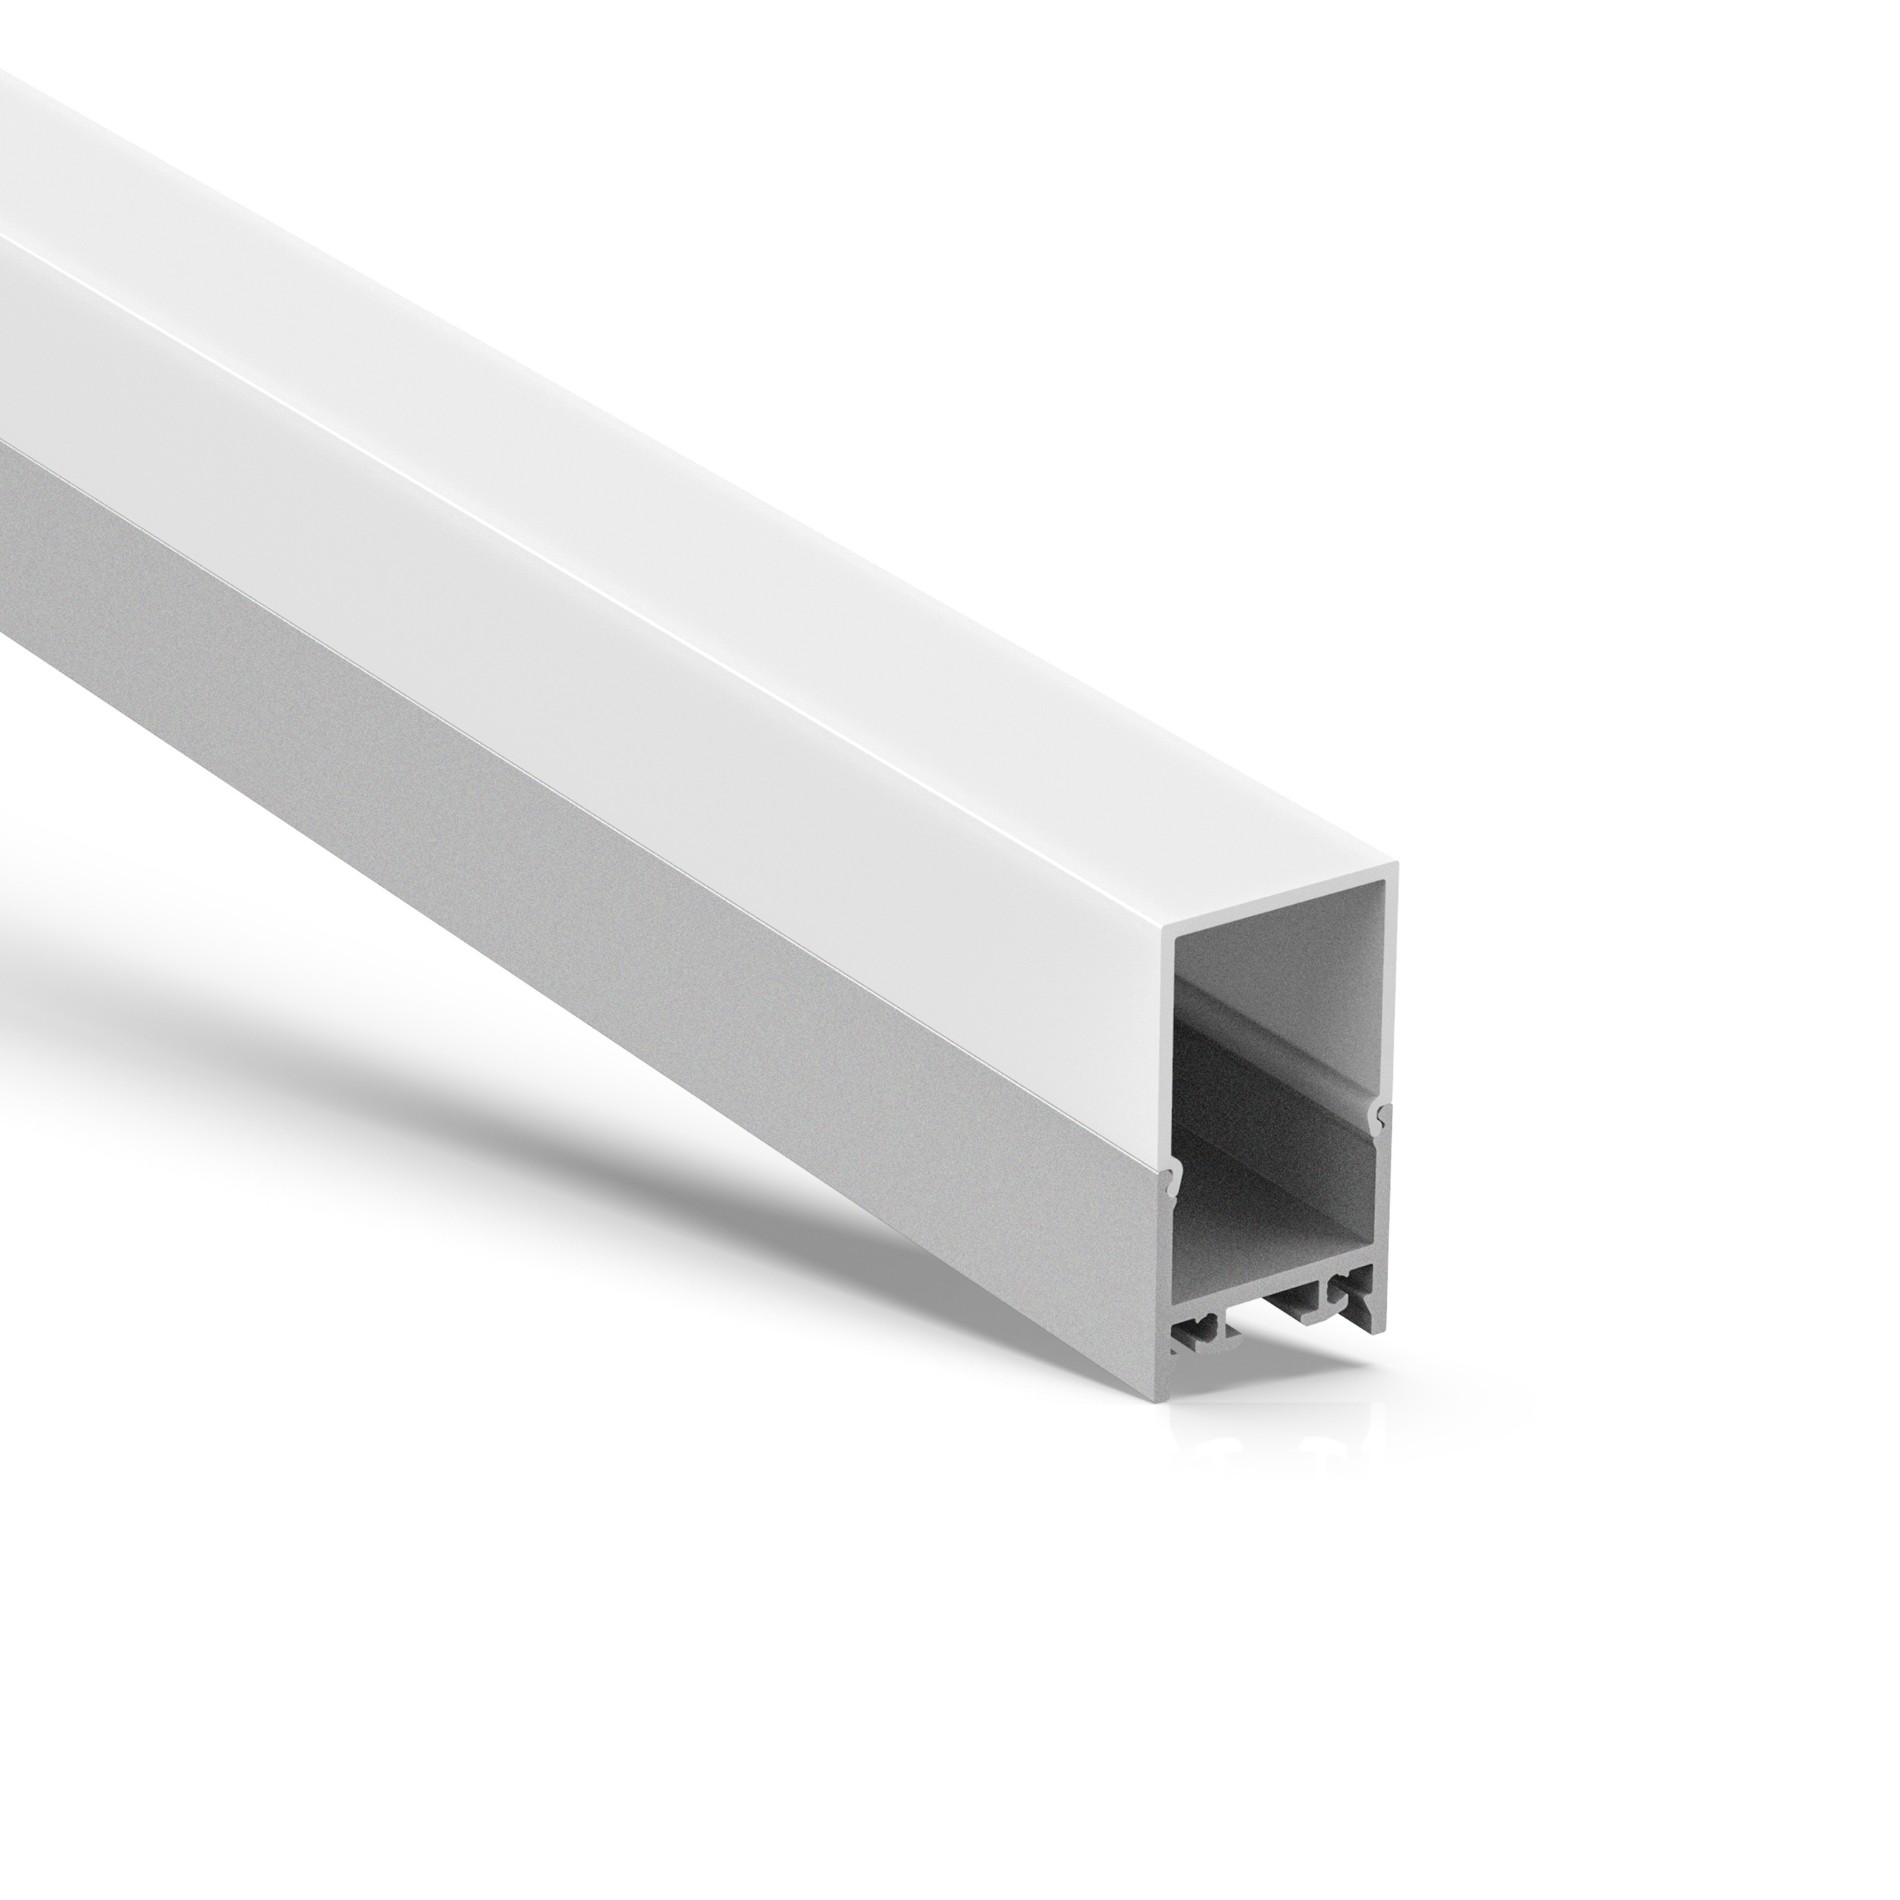 AT16-5H Perfil cuadrado cuadrado de superficie 19.5x35.4mm